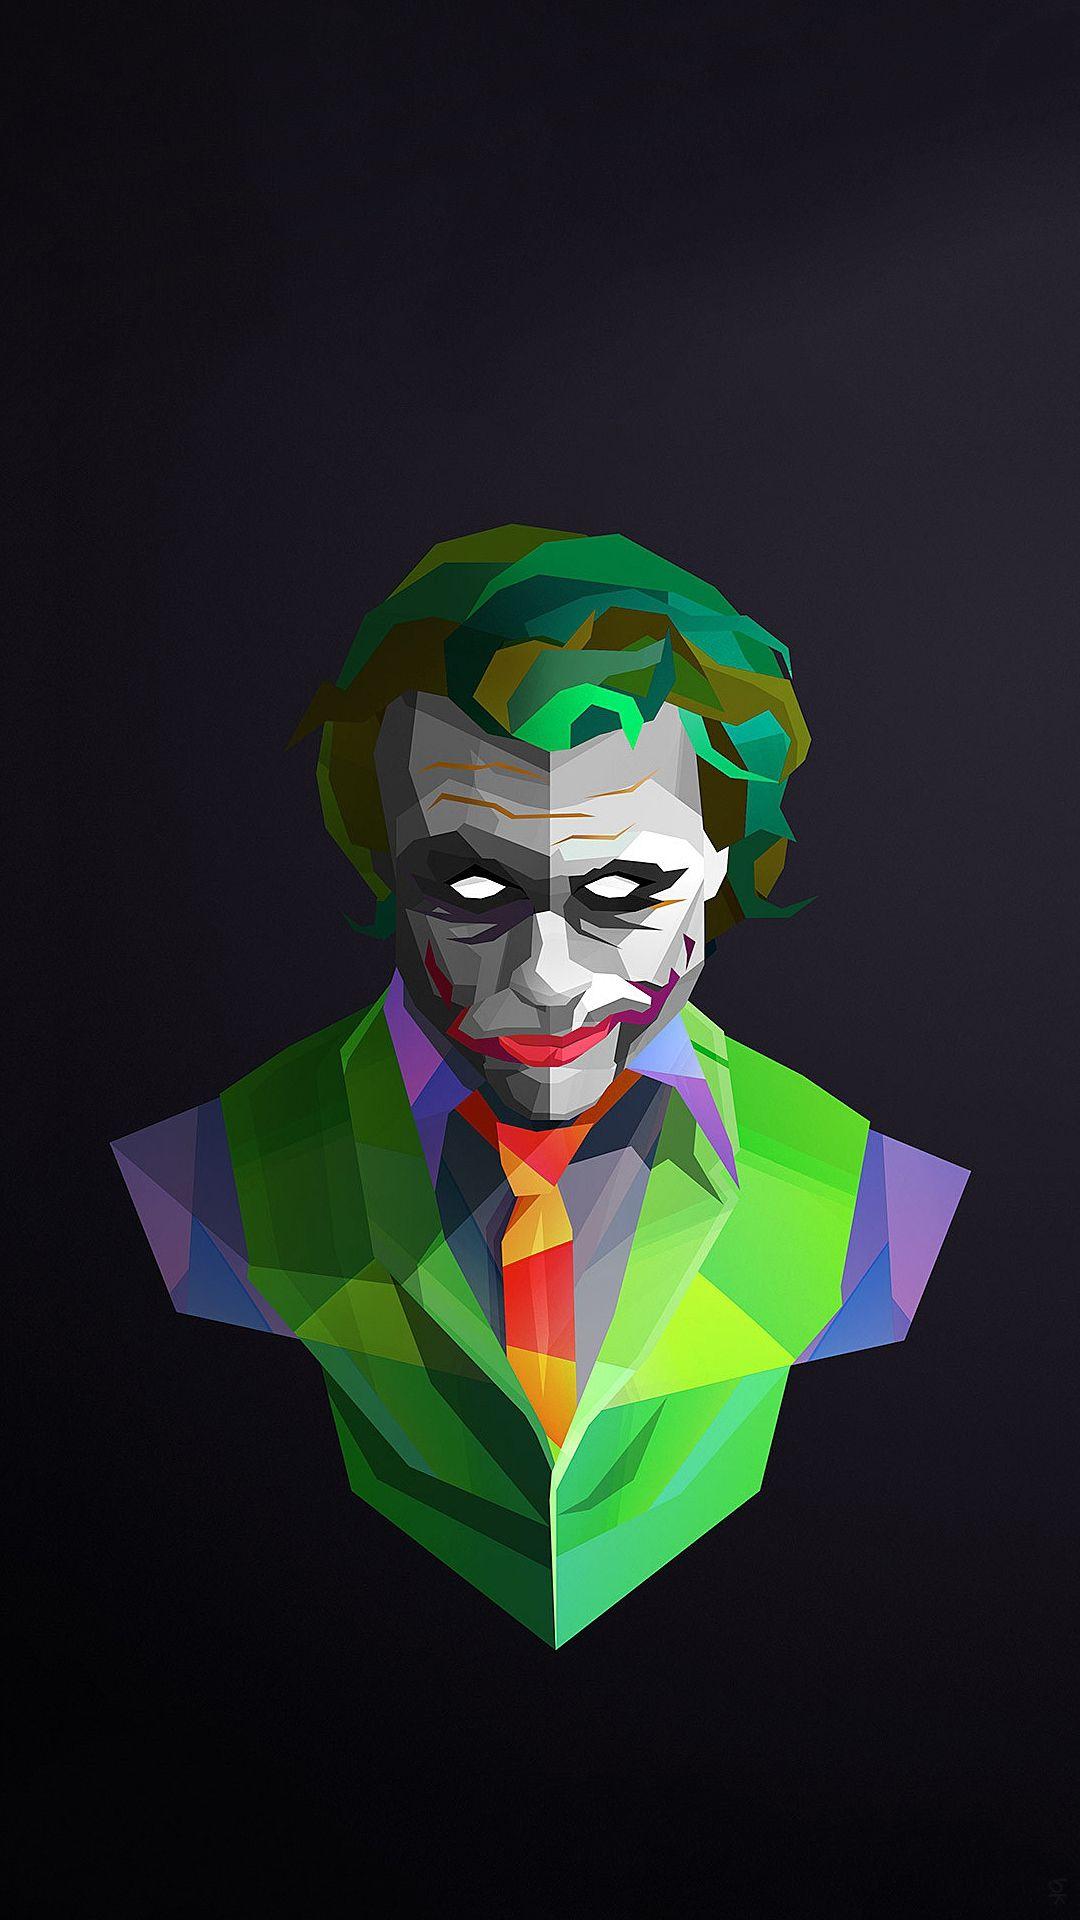 Joker Wallpaper Iphone 6 Plus Por